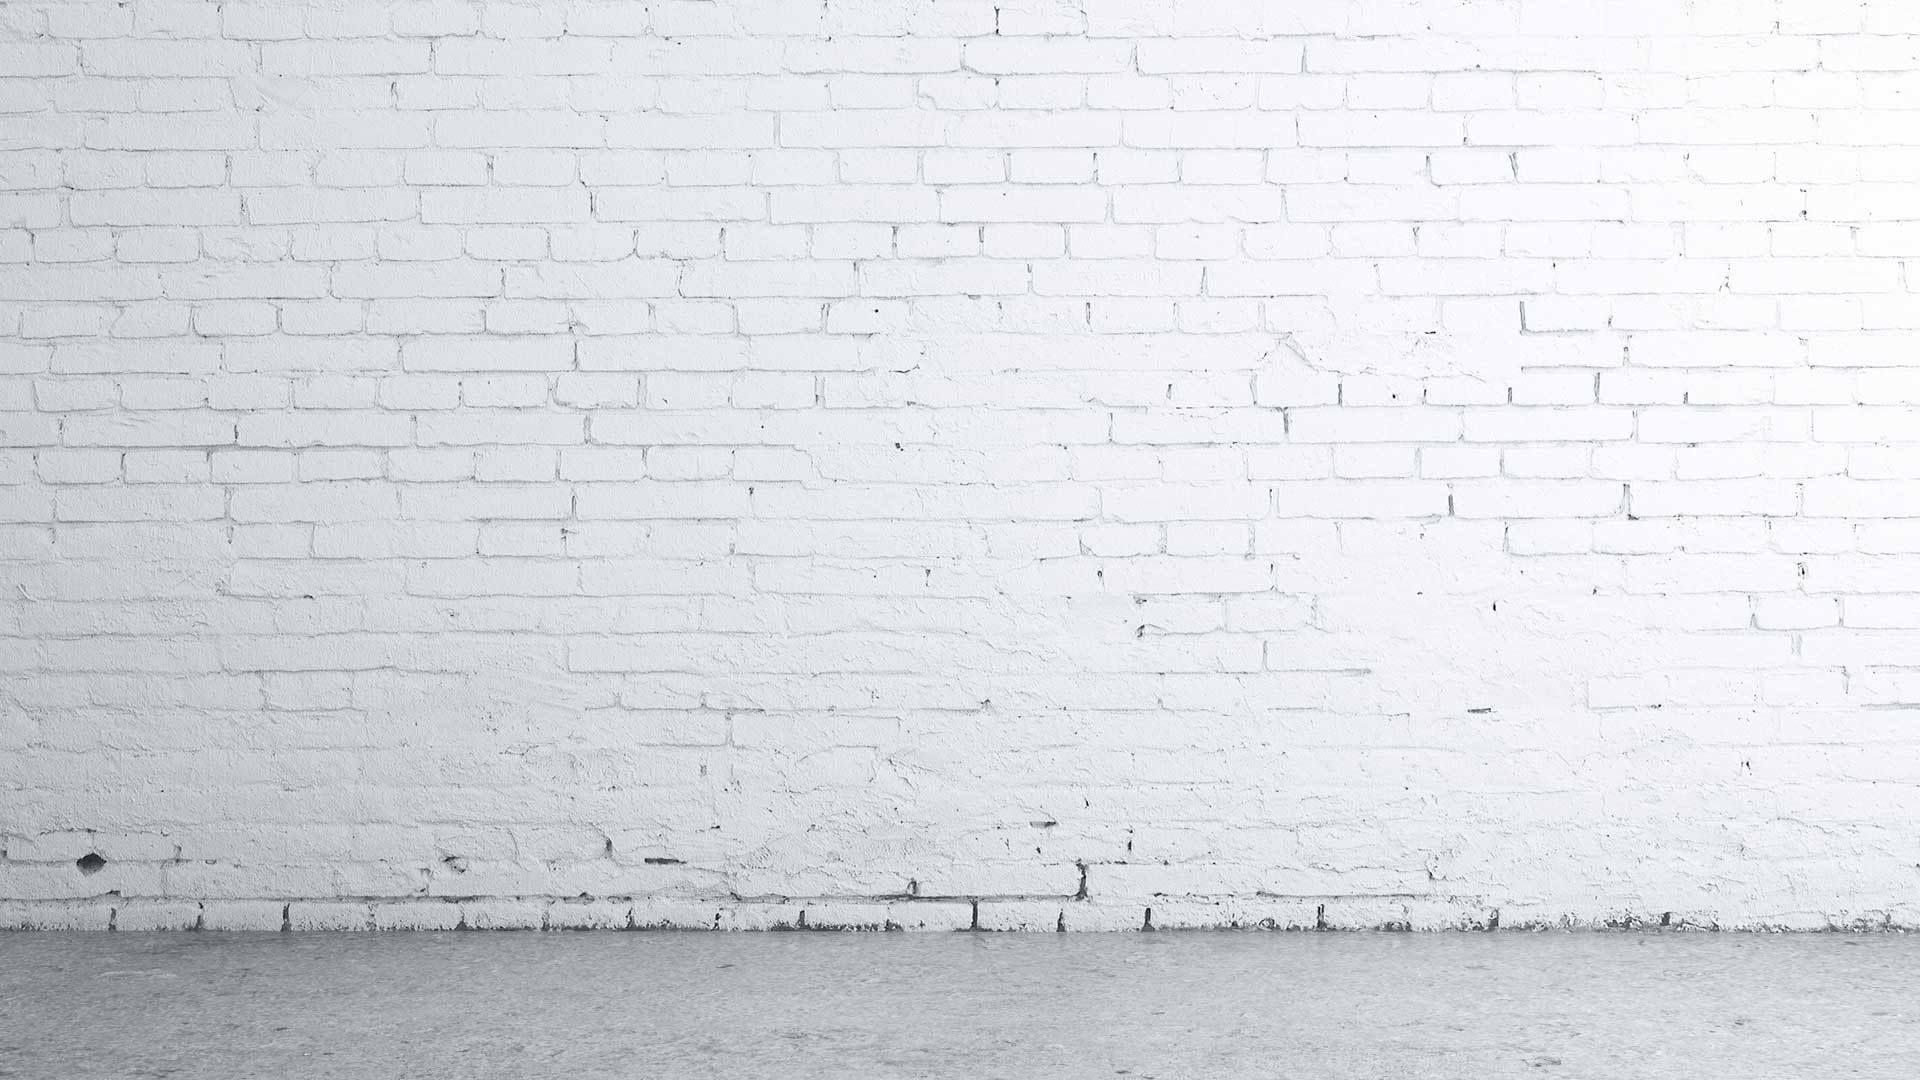 Related Image White Brick Walls White Brick Wallpaper Brick Wallpaper Hd